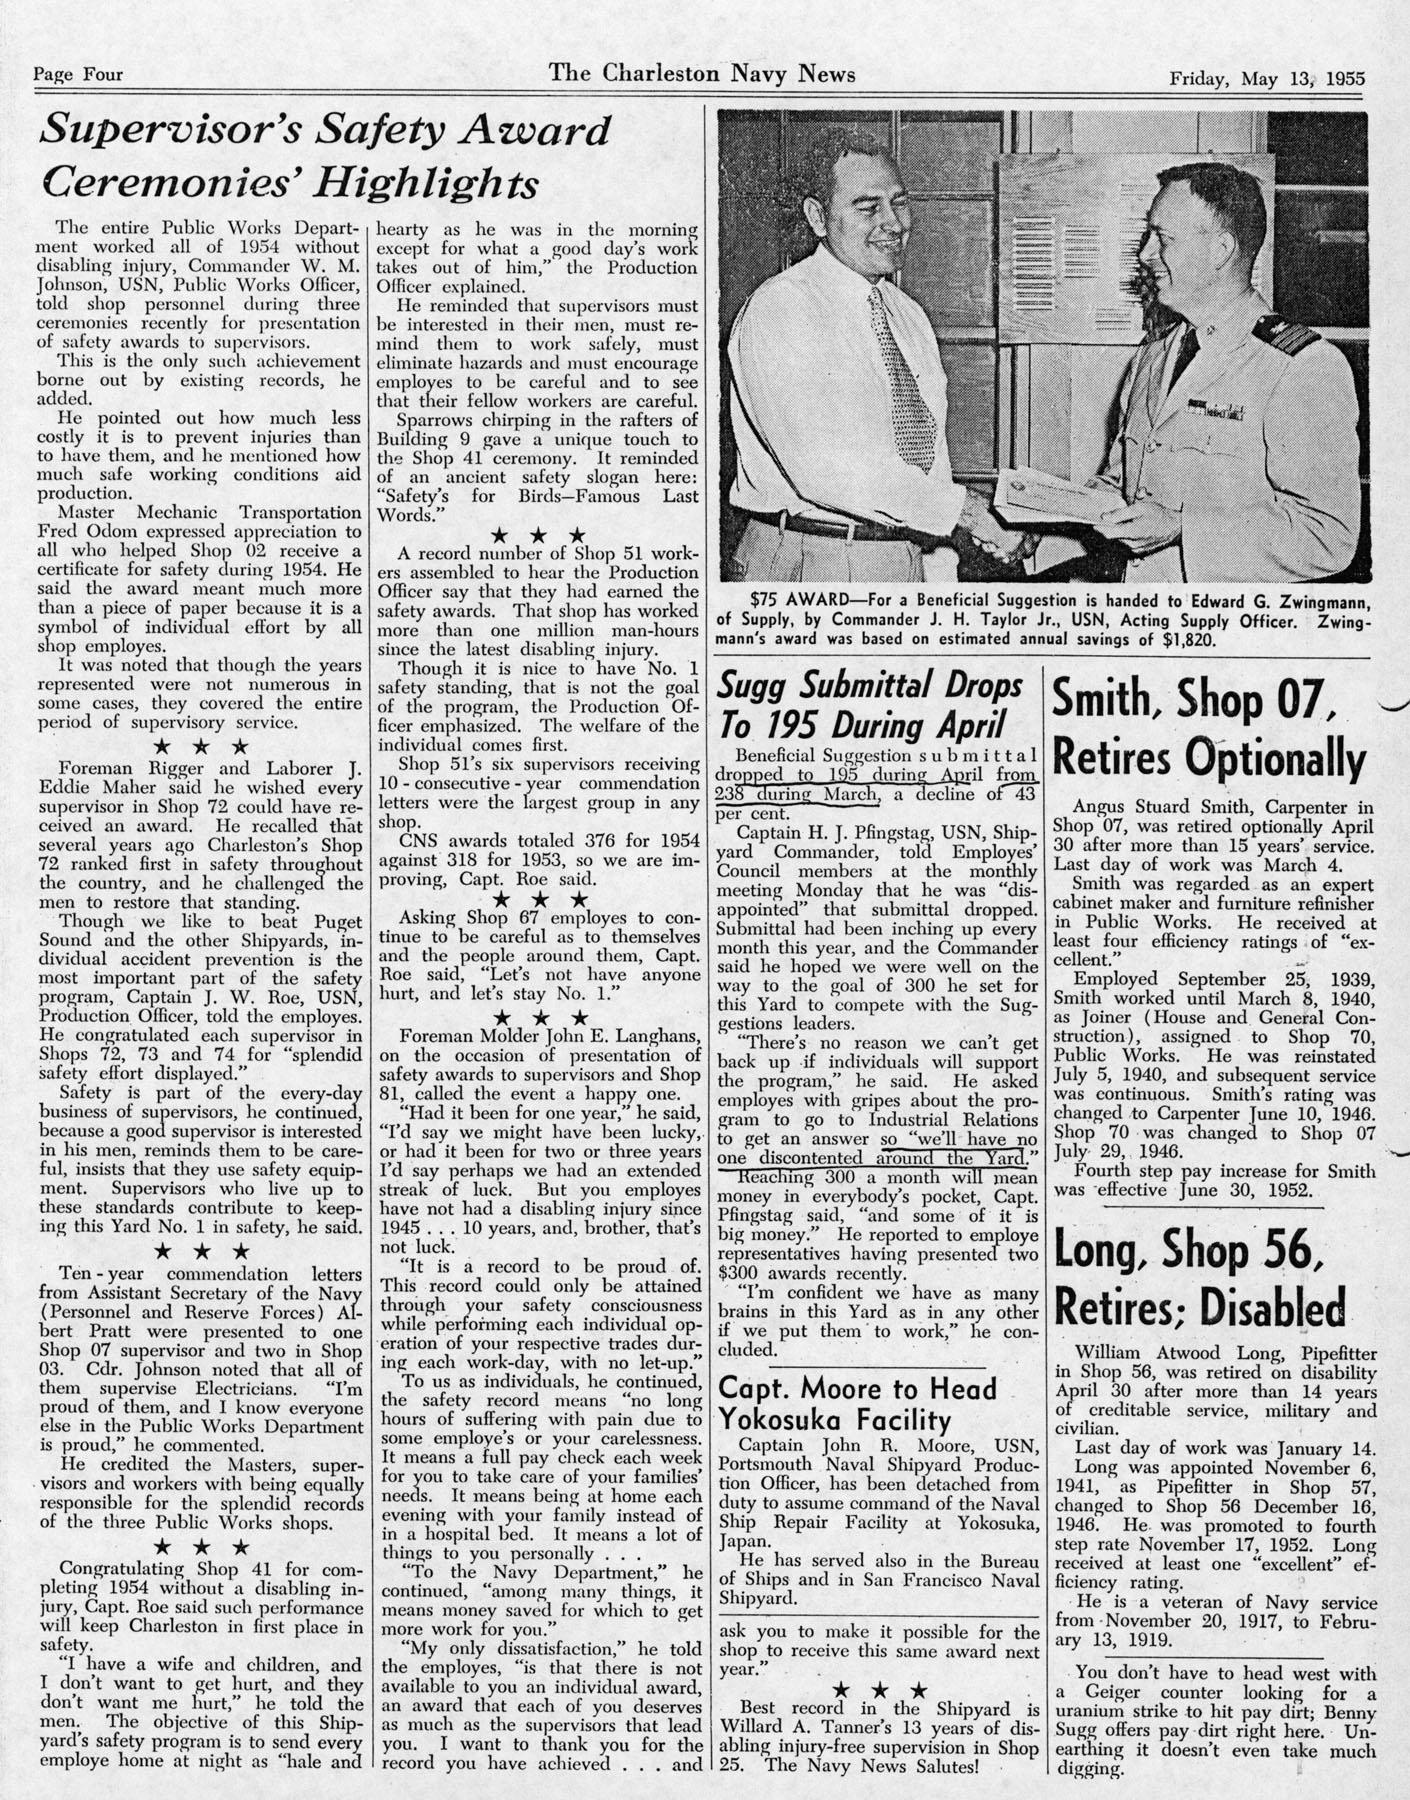 The Charleston Navy News, Volume 13, Edition 22, page iv